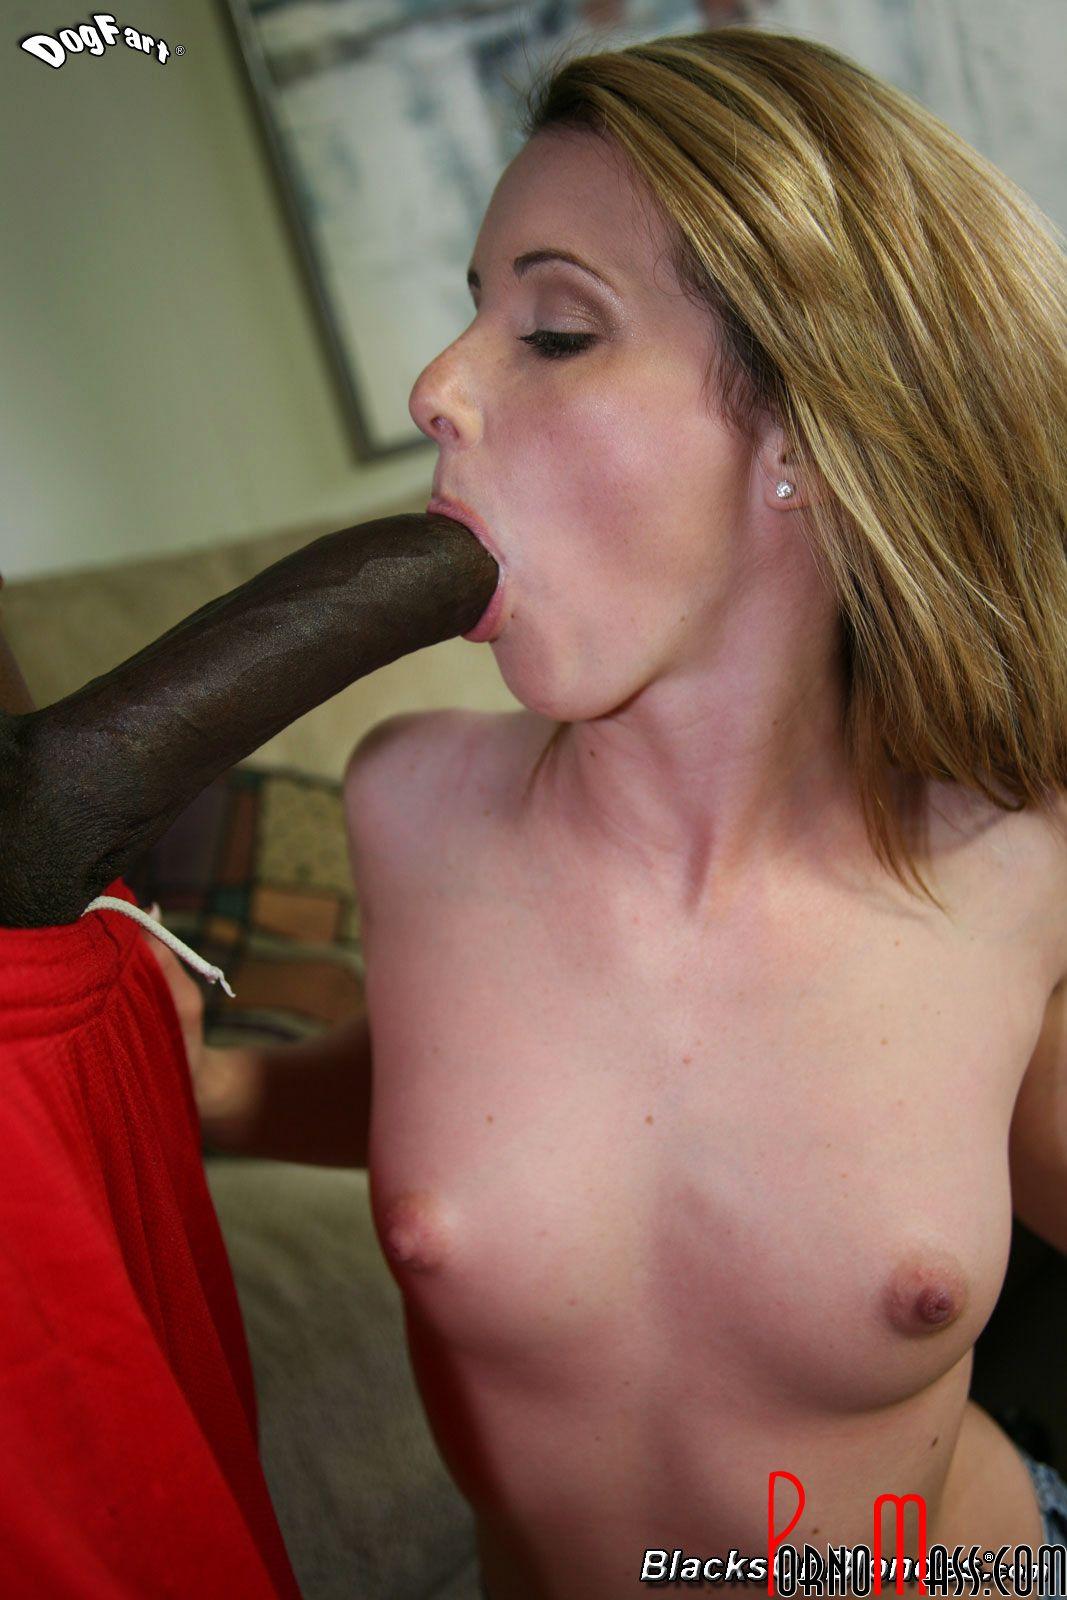 Seual Intercourse With Oral